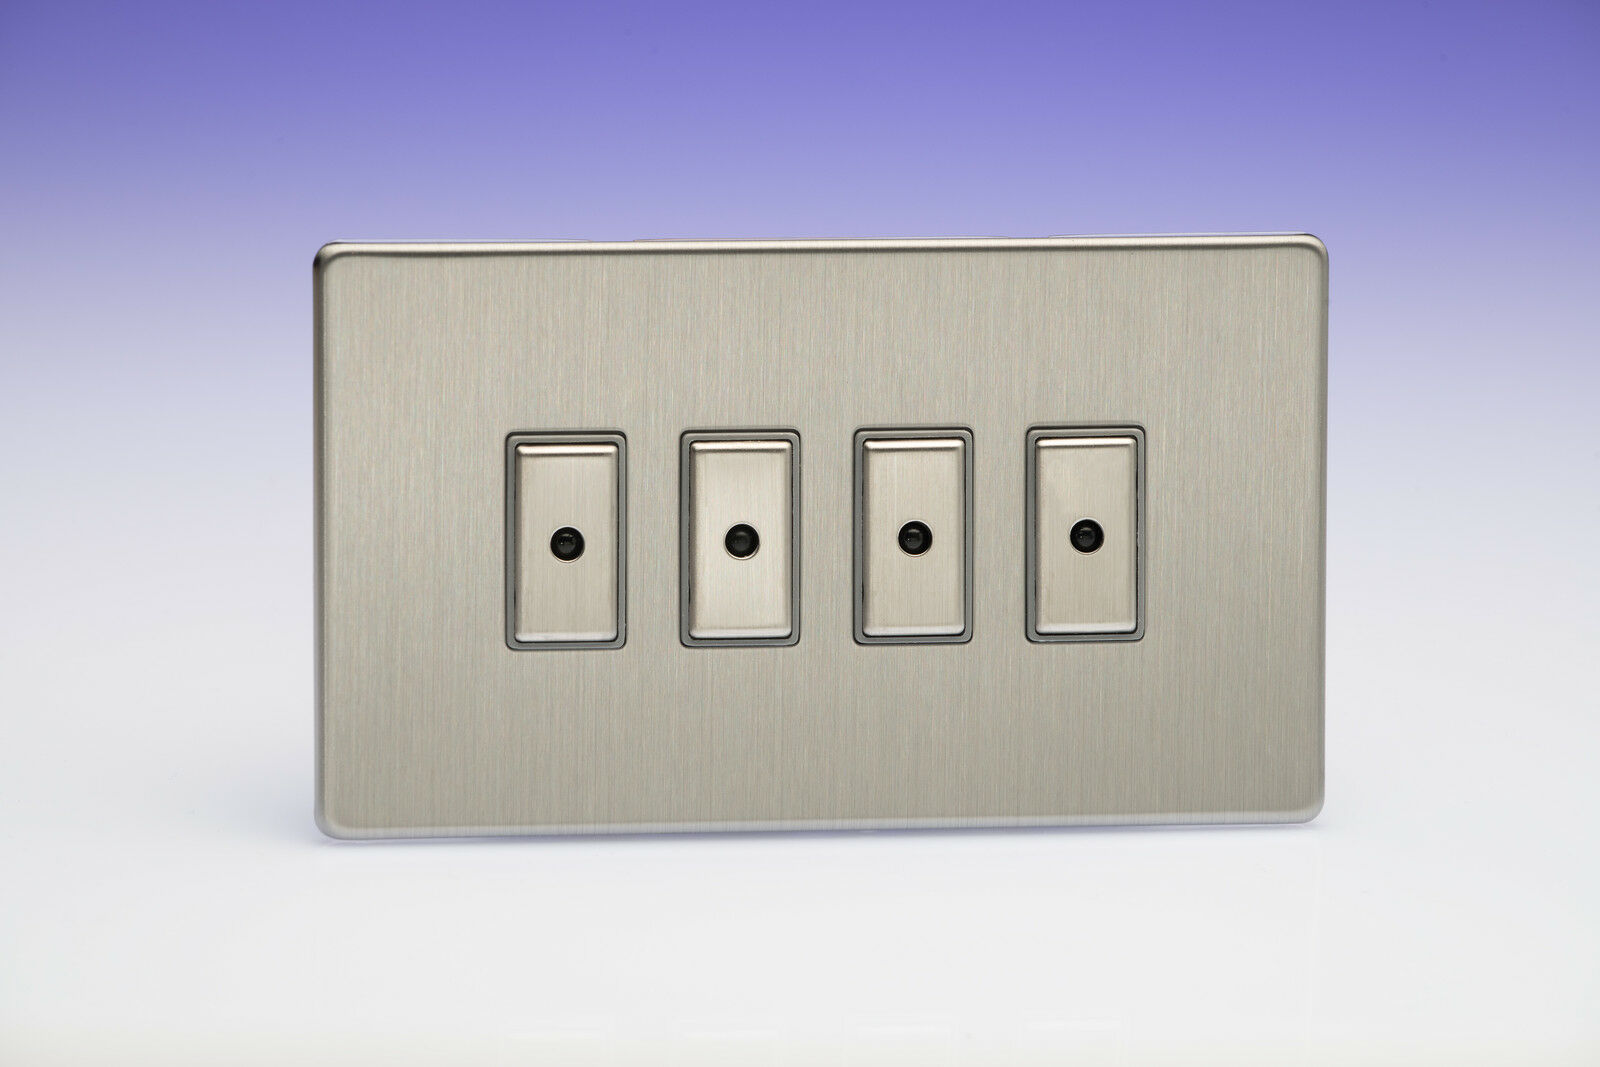 Varilight Eclique 2 4-GANG 1-Way TELECOMANDO TATTILE Touch Control Control Control MASTER LED dimmer a9c648